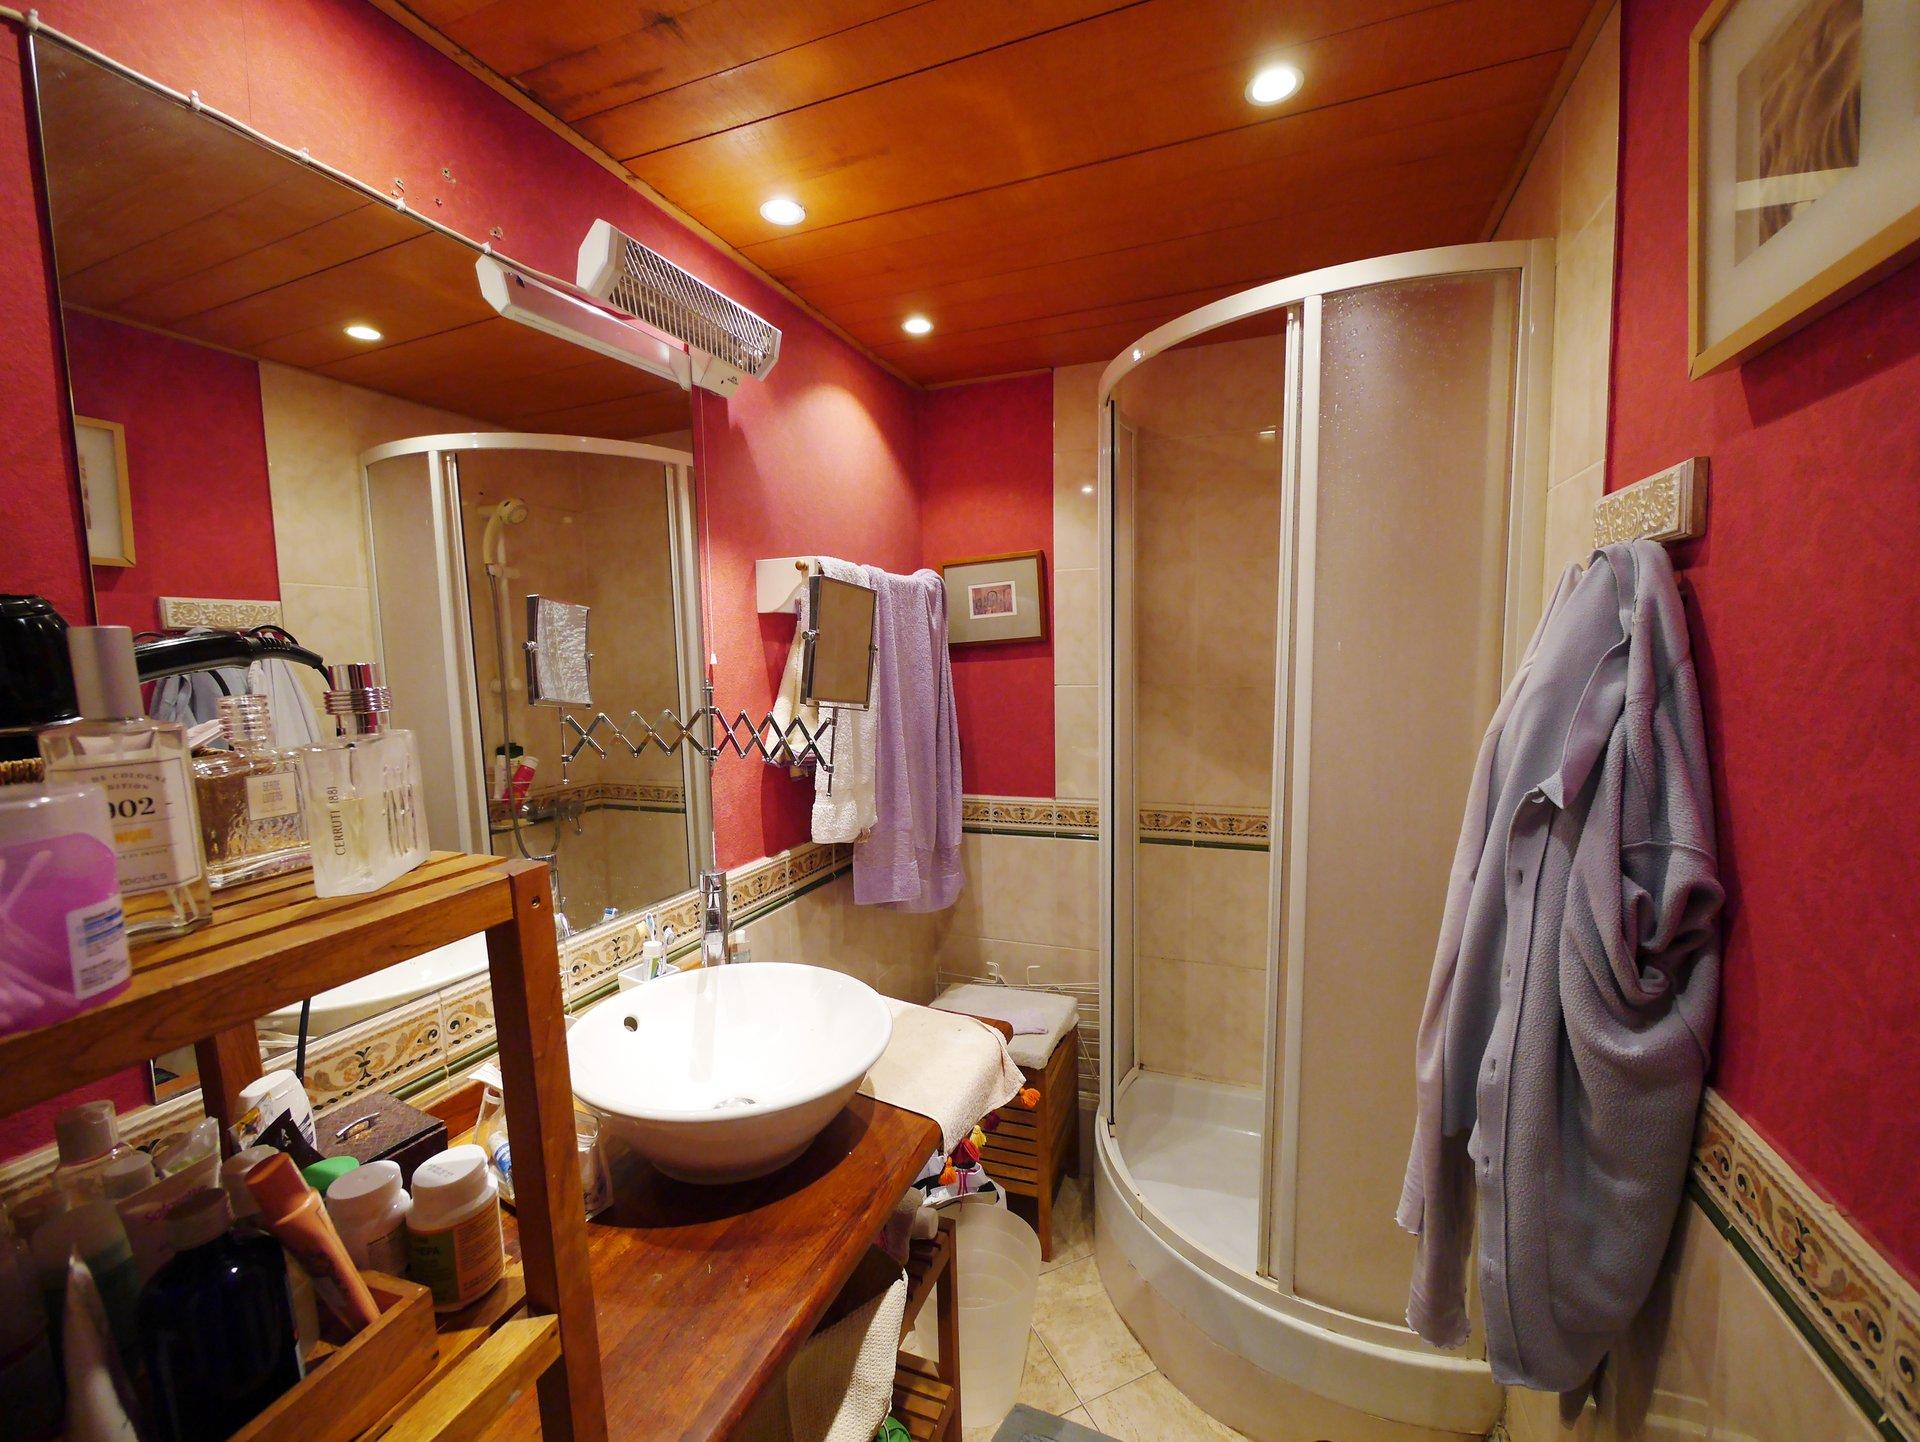 Sale 3-room apartment Tramontane